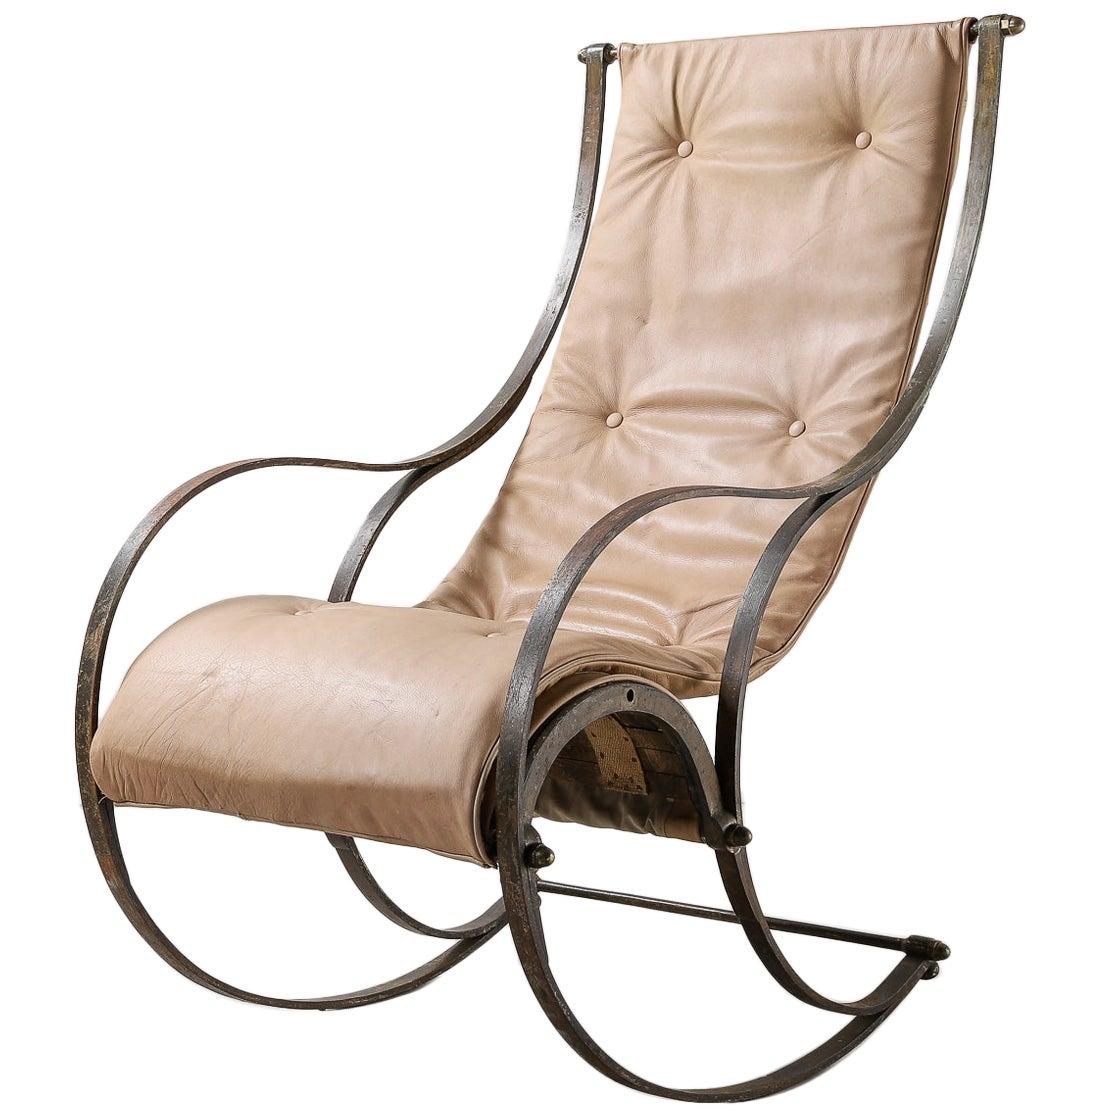 19th Century Rocking Chair